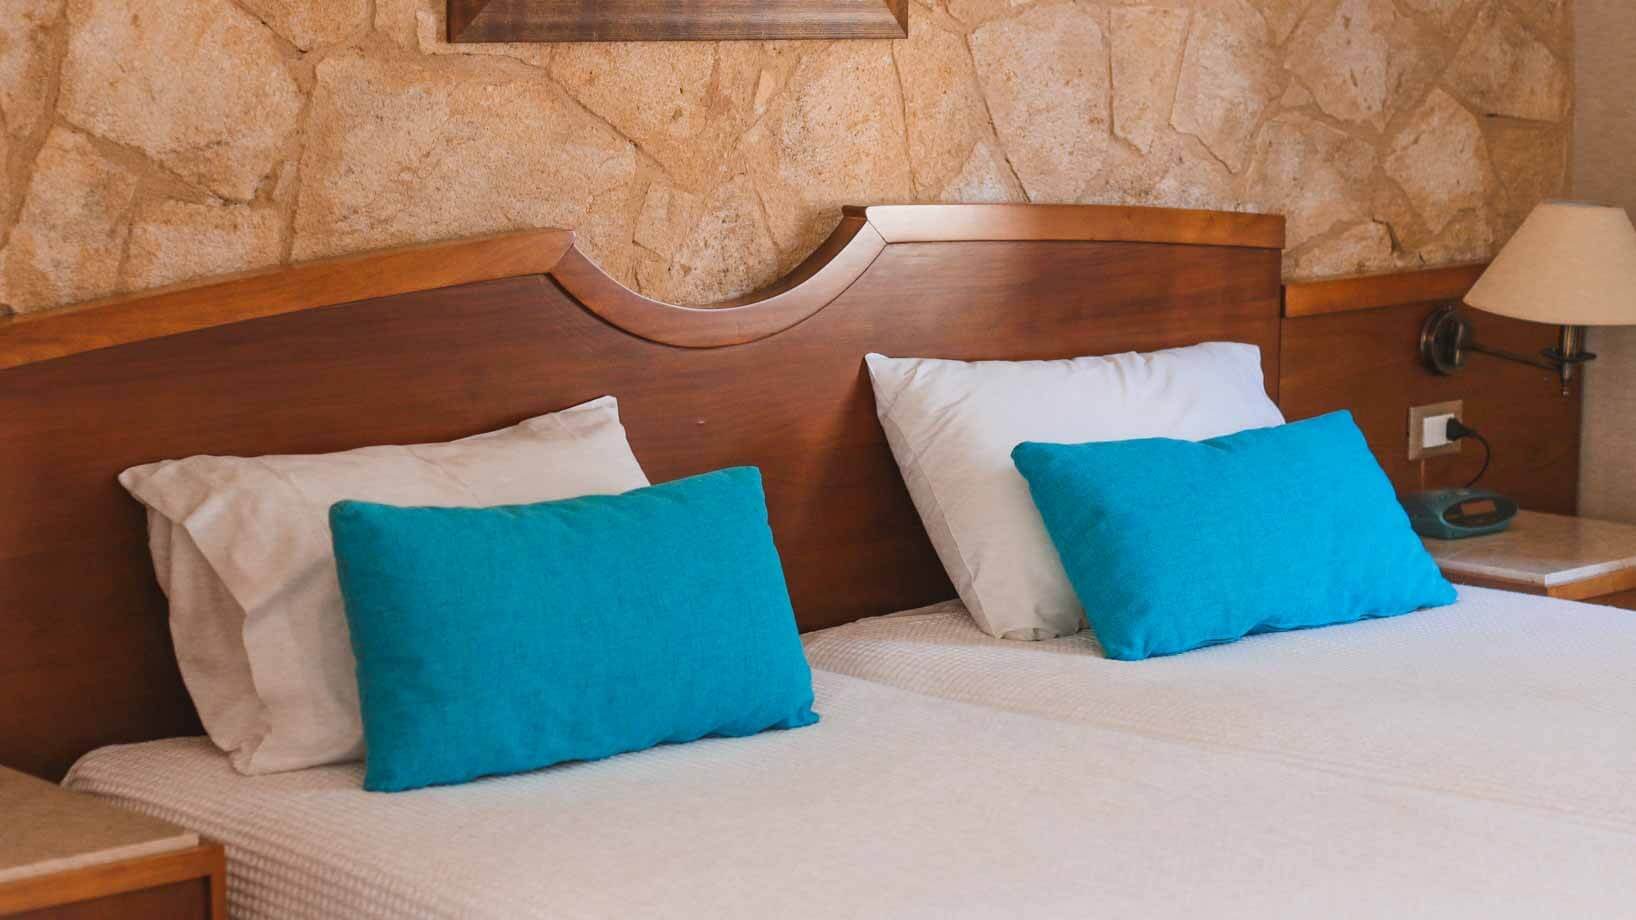 Elotis Suites Room. 5 Restaurants in Crete to visit on your Greek island vacation